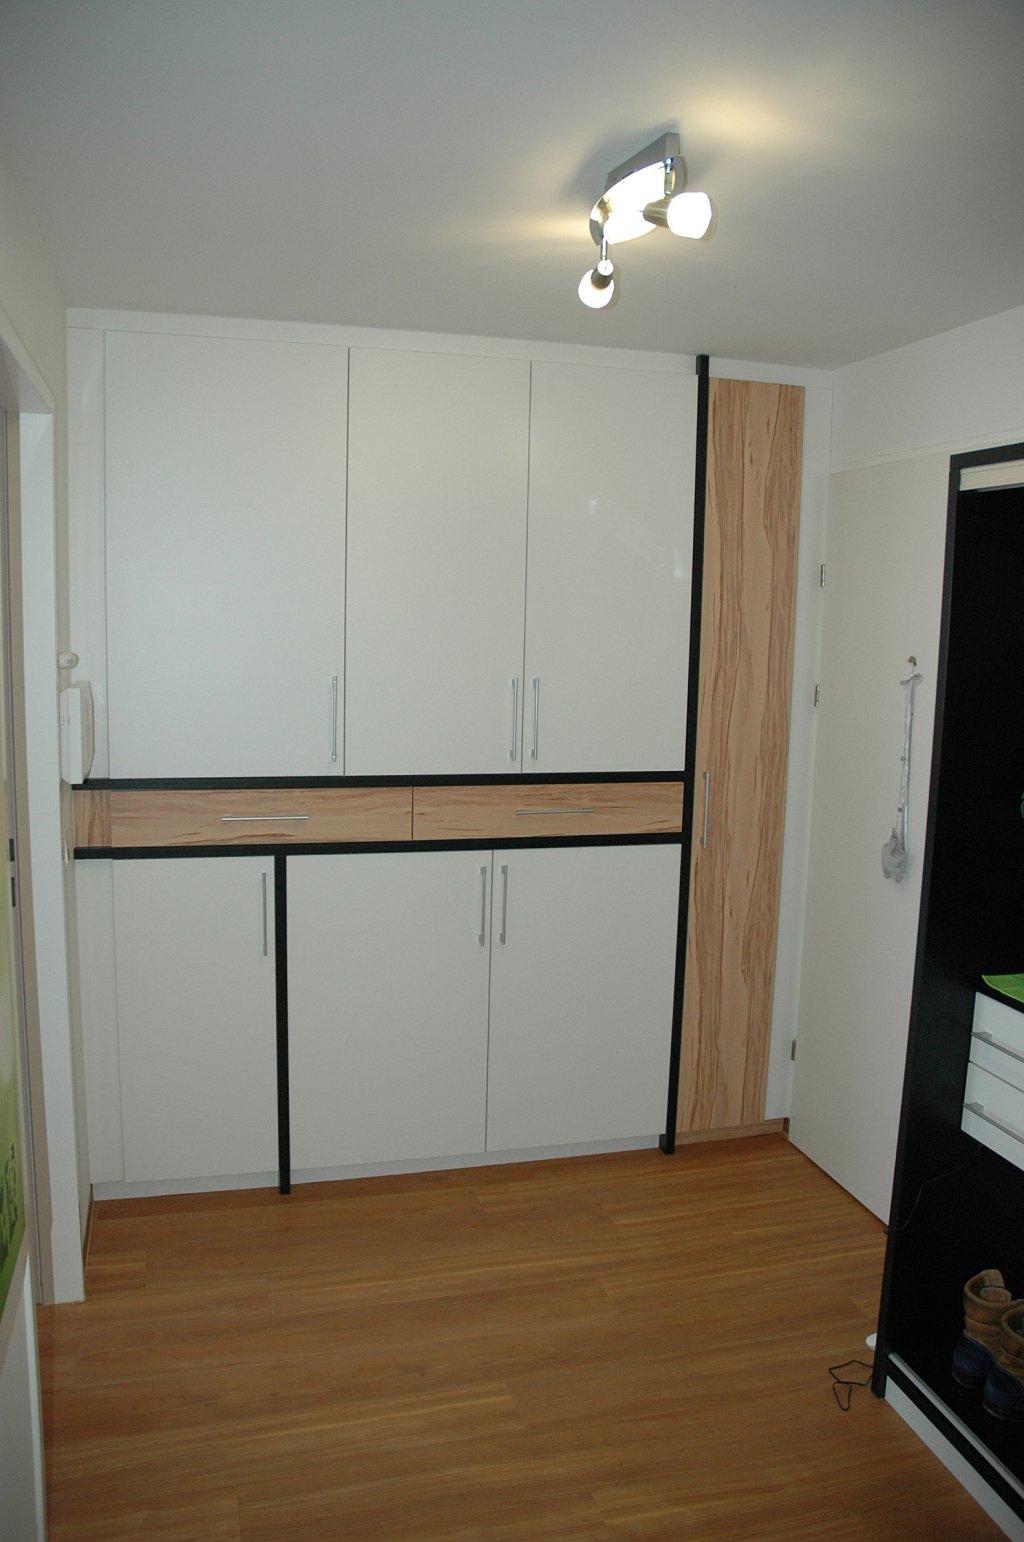 kundenplanung 0197 filiale 2000 stockerau p max ma m bel tischlerqualit t aus sterreich. Black Bedroom Furniture Sets. Home Design Ideas